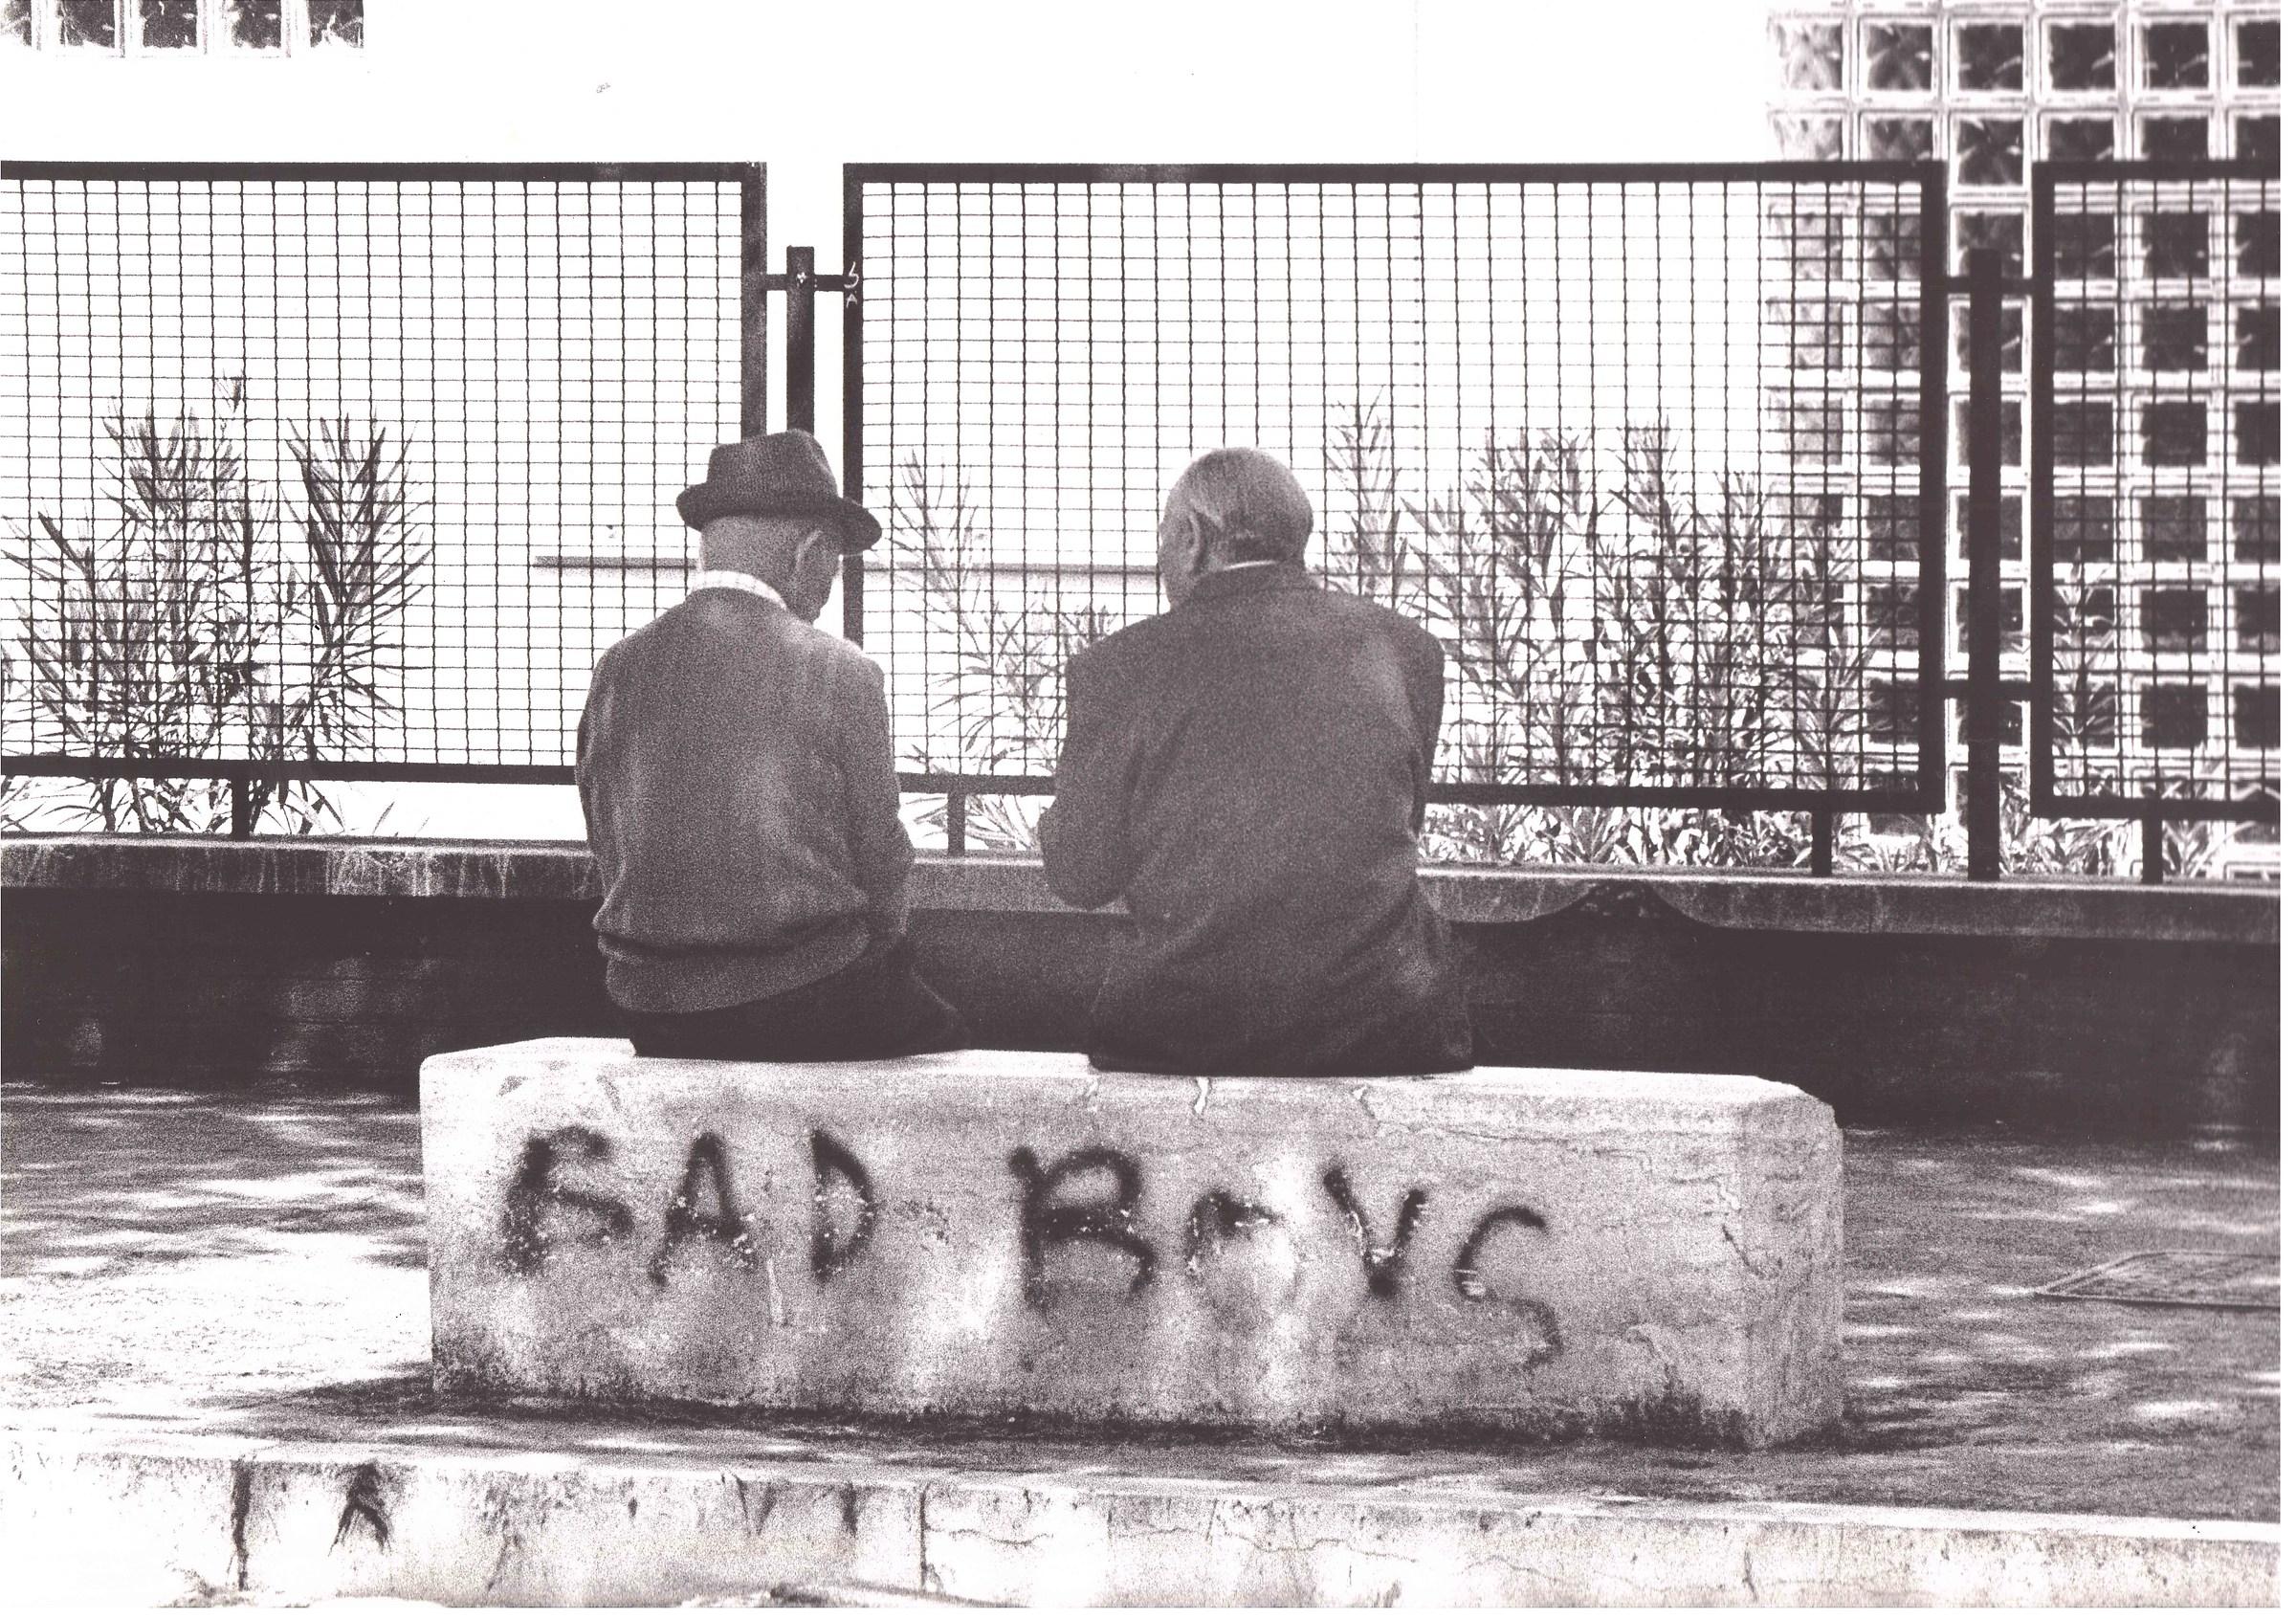 Those bad boys...